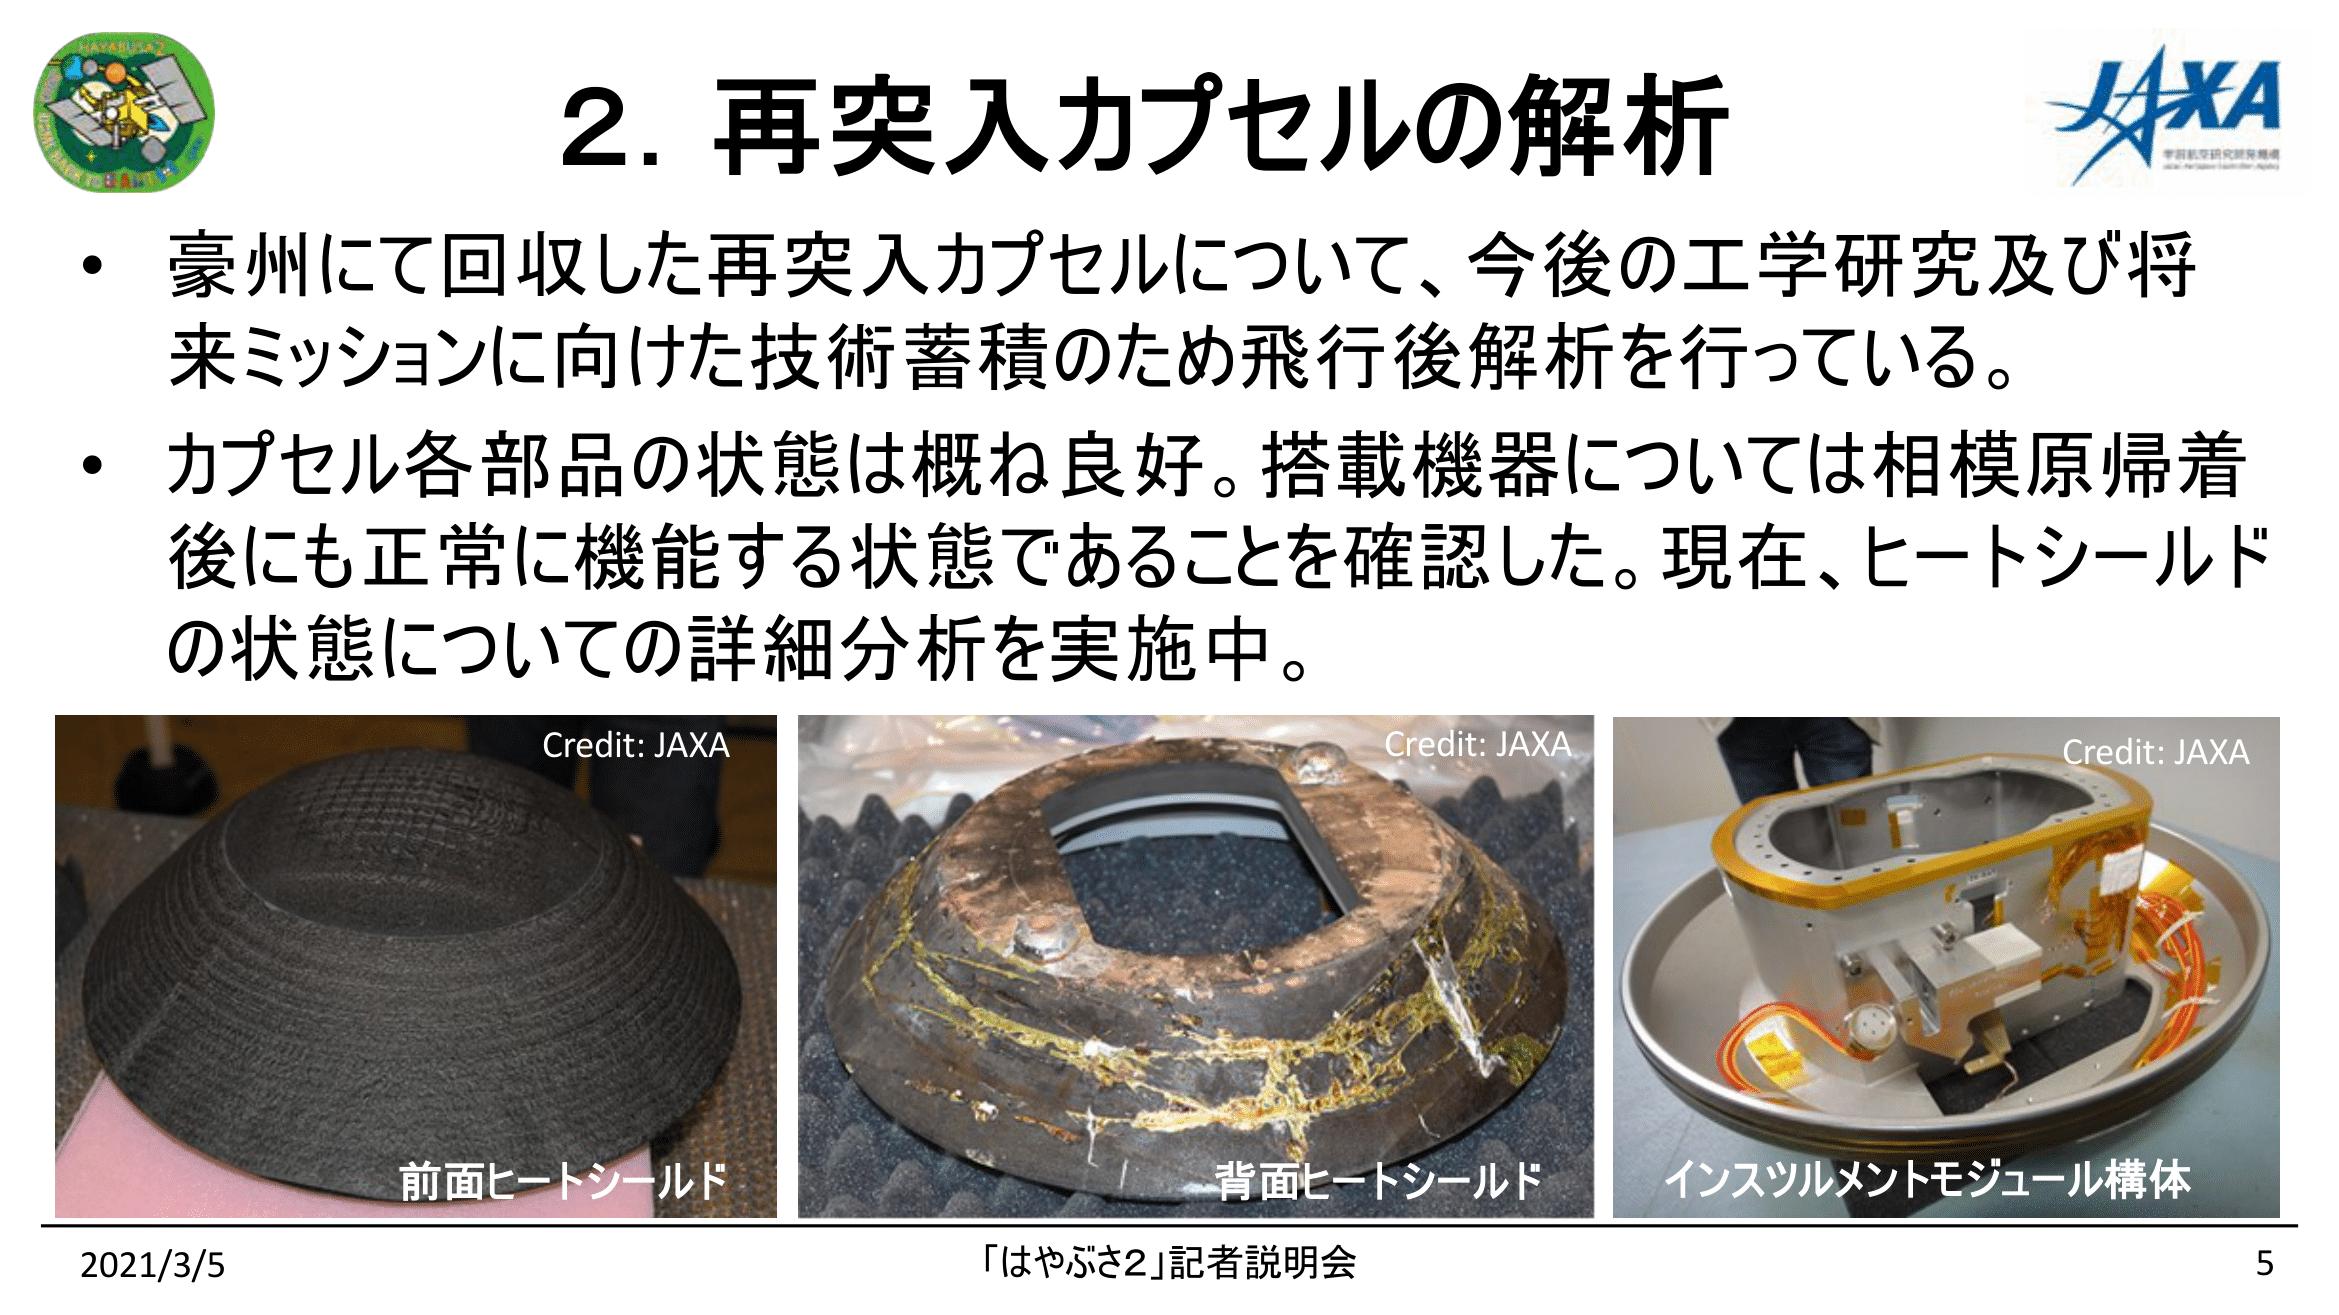 f:id:Imamura:20210305134040p:plain